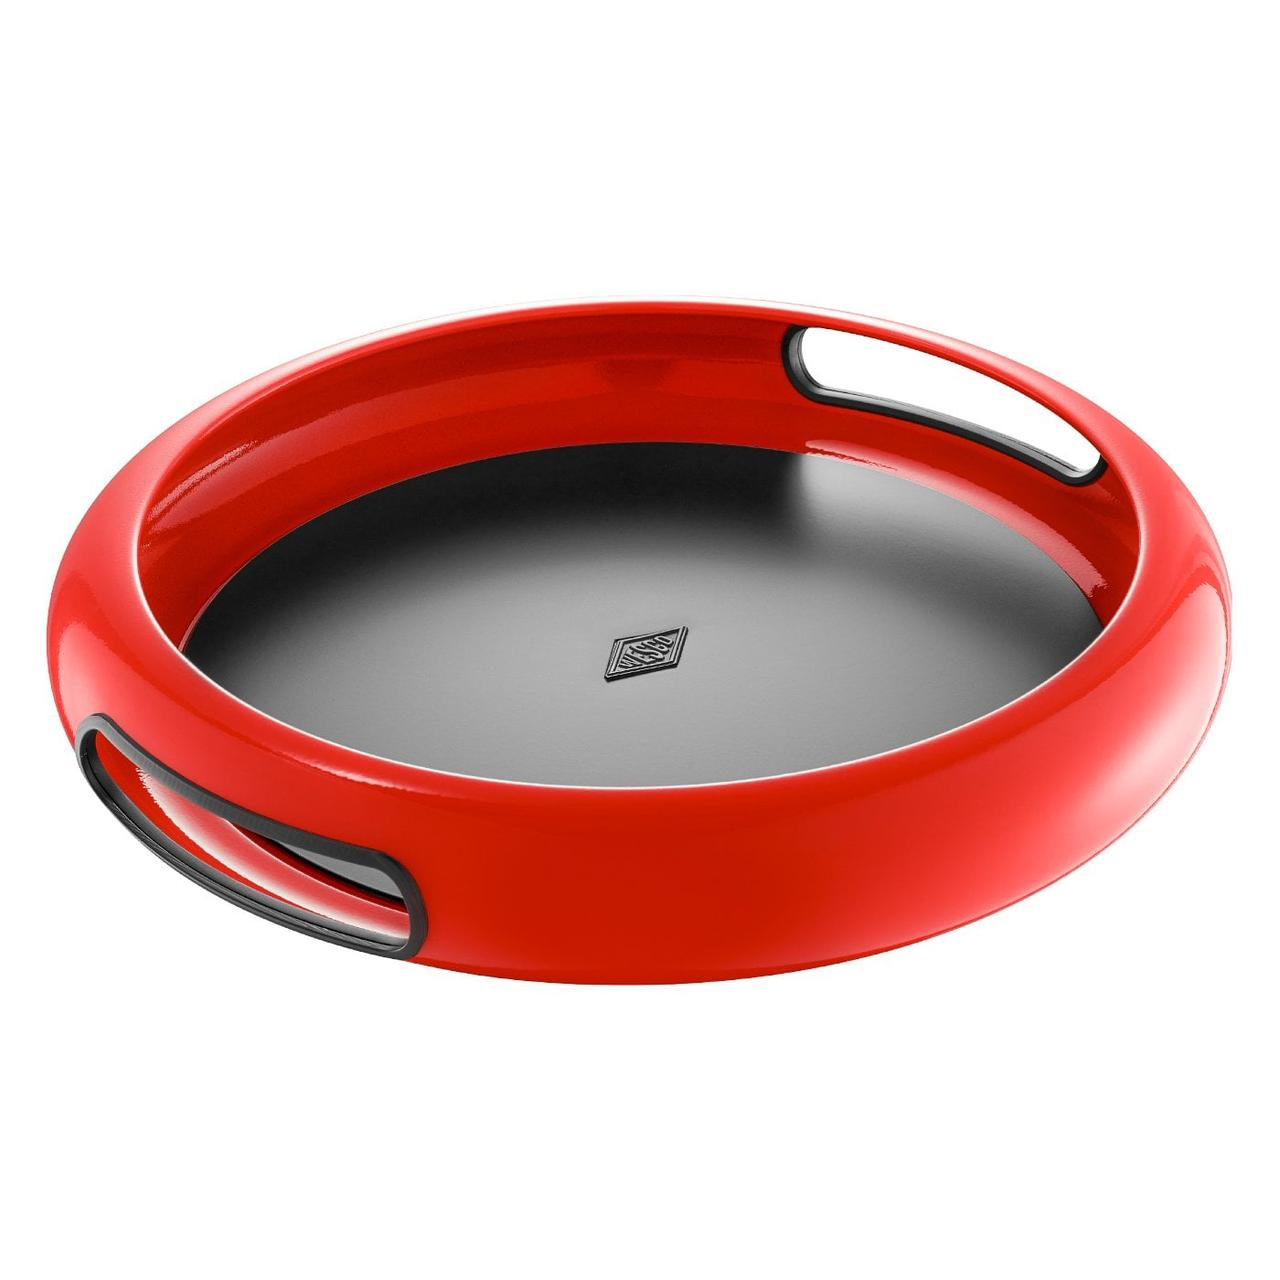 Поднос Wesco Spasy Tray красный 322101-02